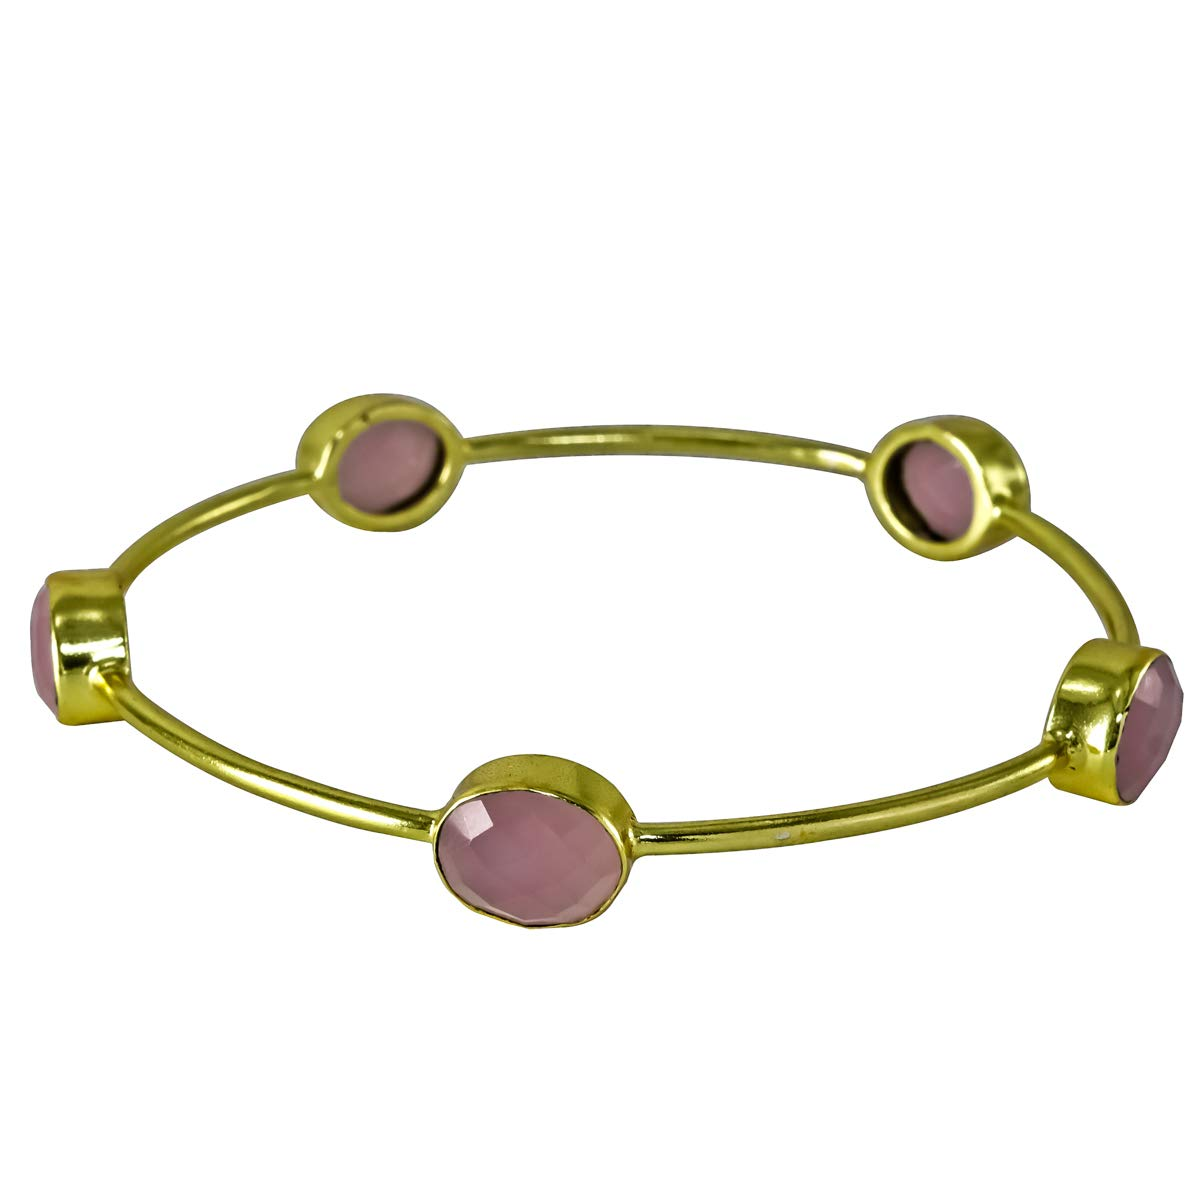 Handmade Bangles /& Bracelets Bezel 65 Cms Pink Chalcedony 18k Gold Plated Brass Stackable,